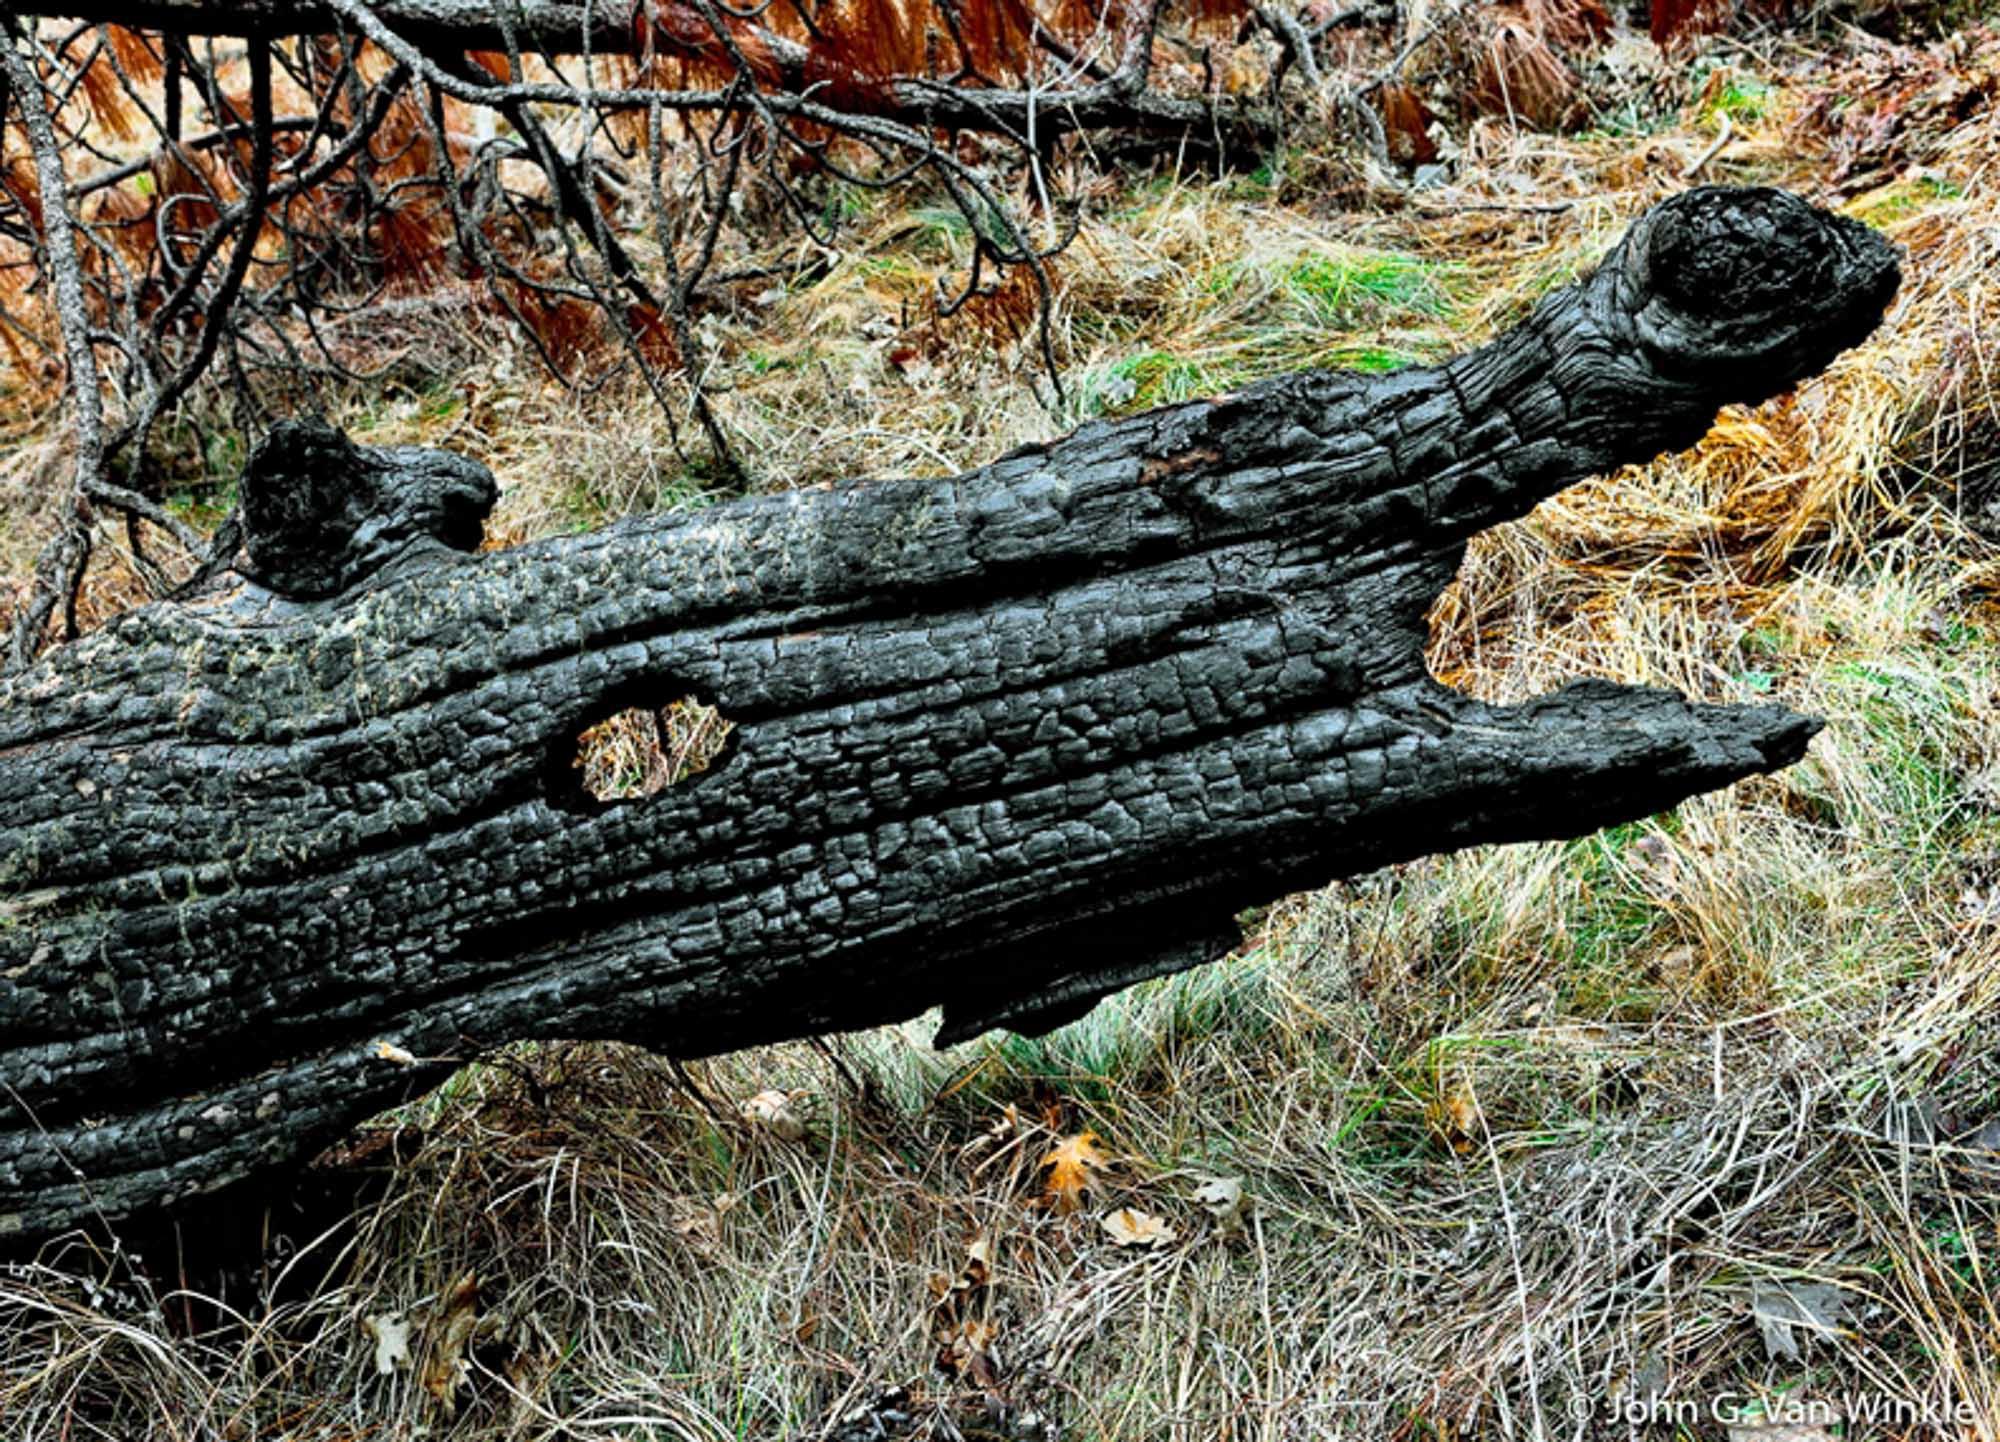 Burned Log, El Capitan Meadow, Yosemite National Park, California